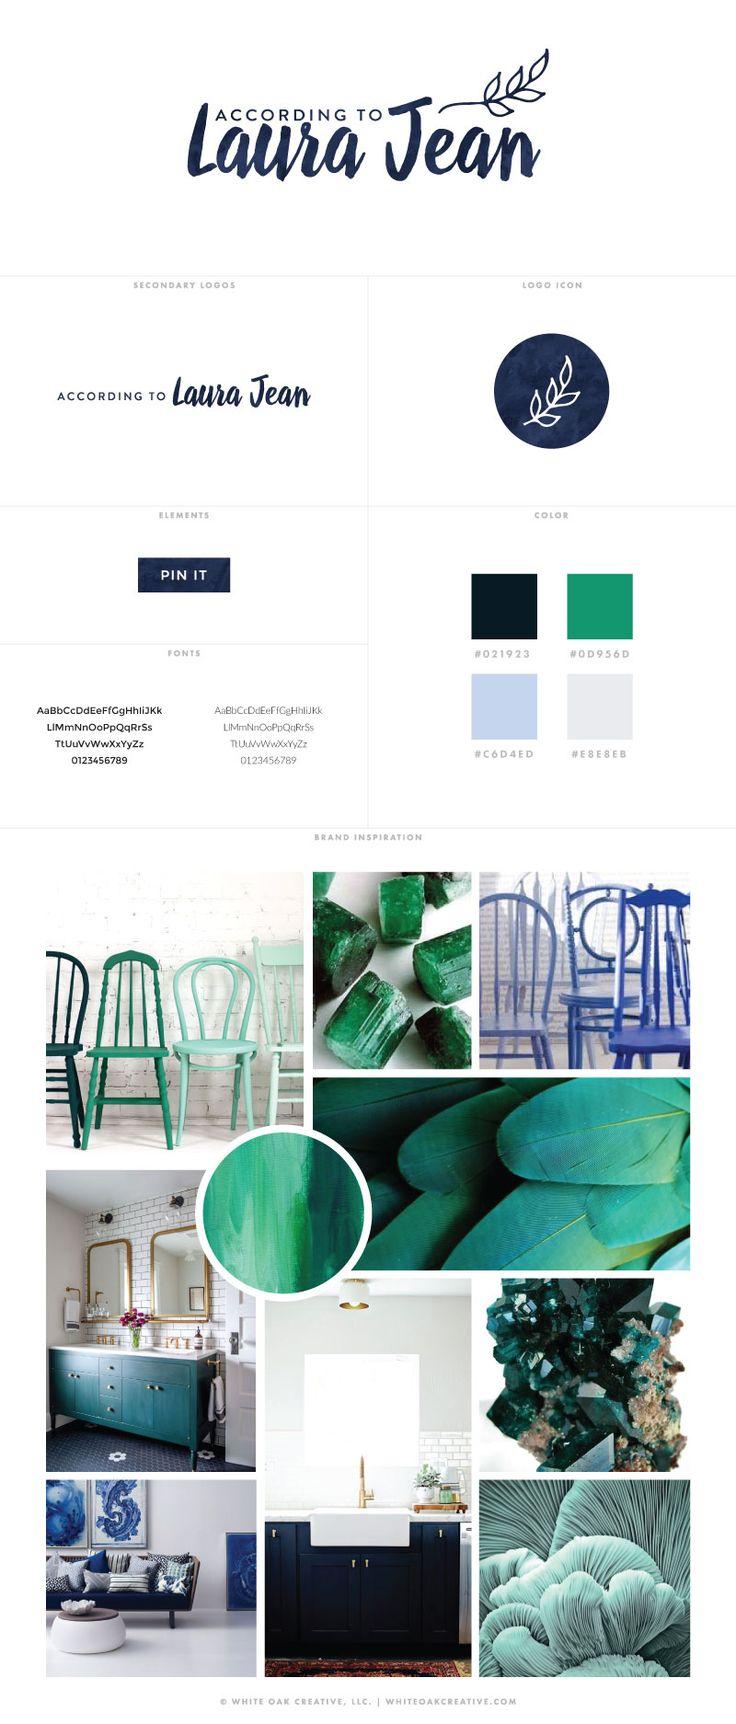 WordPress Blog Design Project for According to Laura Jeanlogo design, logo identity, brand design, blog designer, wordpress